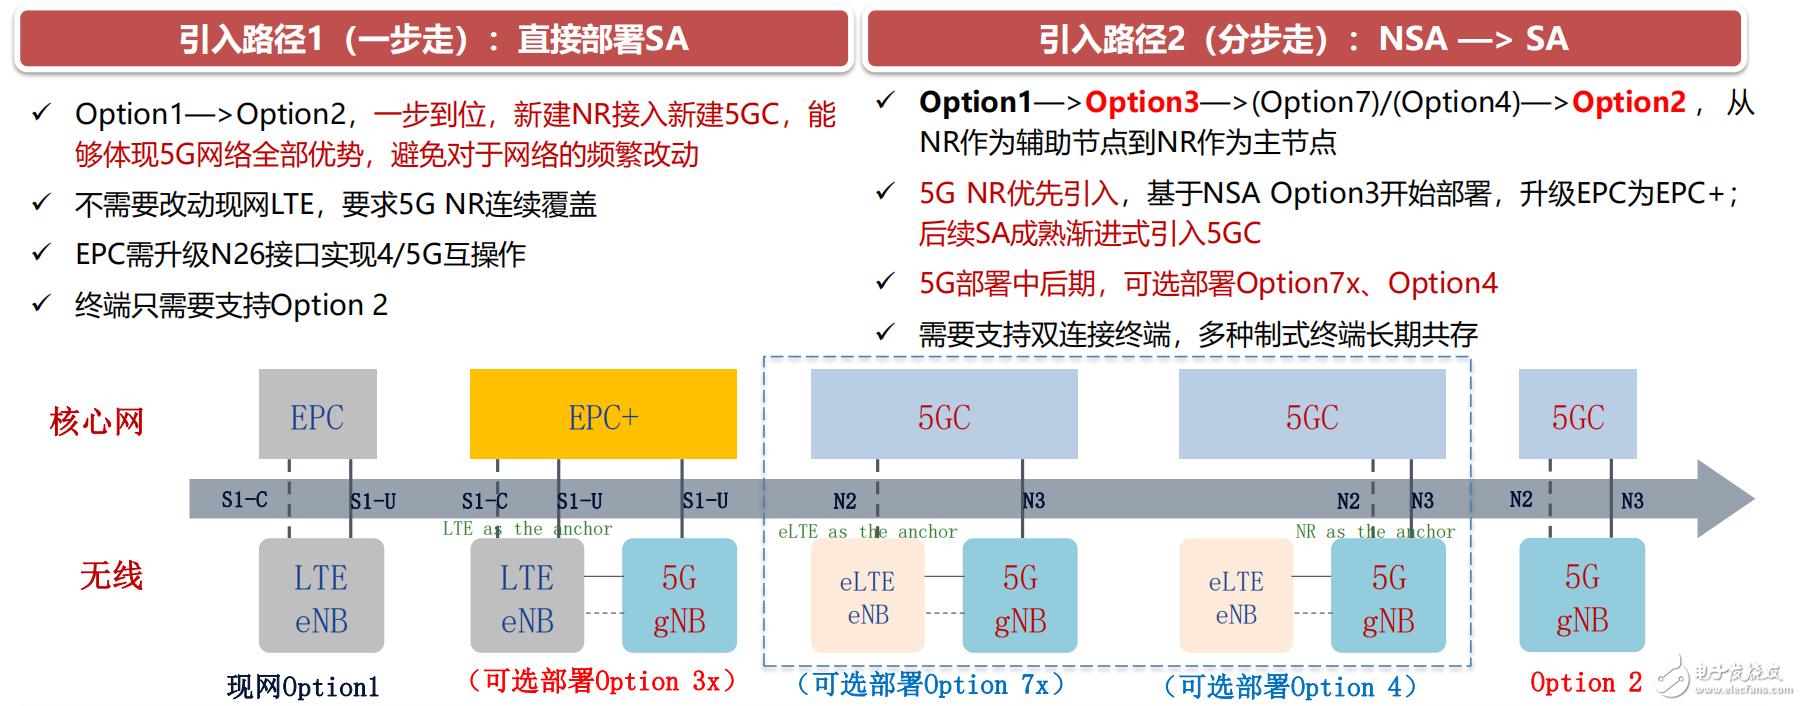 5G核心网建设的难点和挑战全面分析